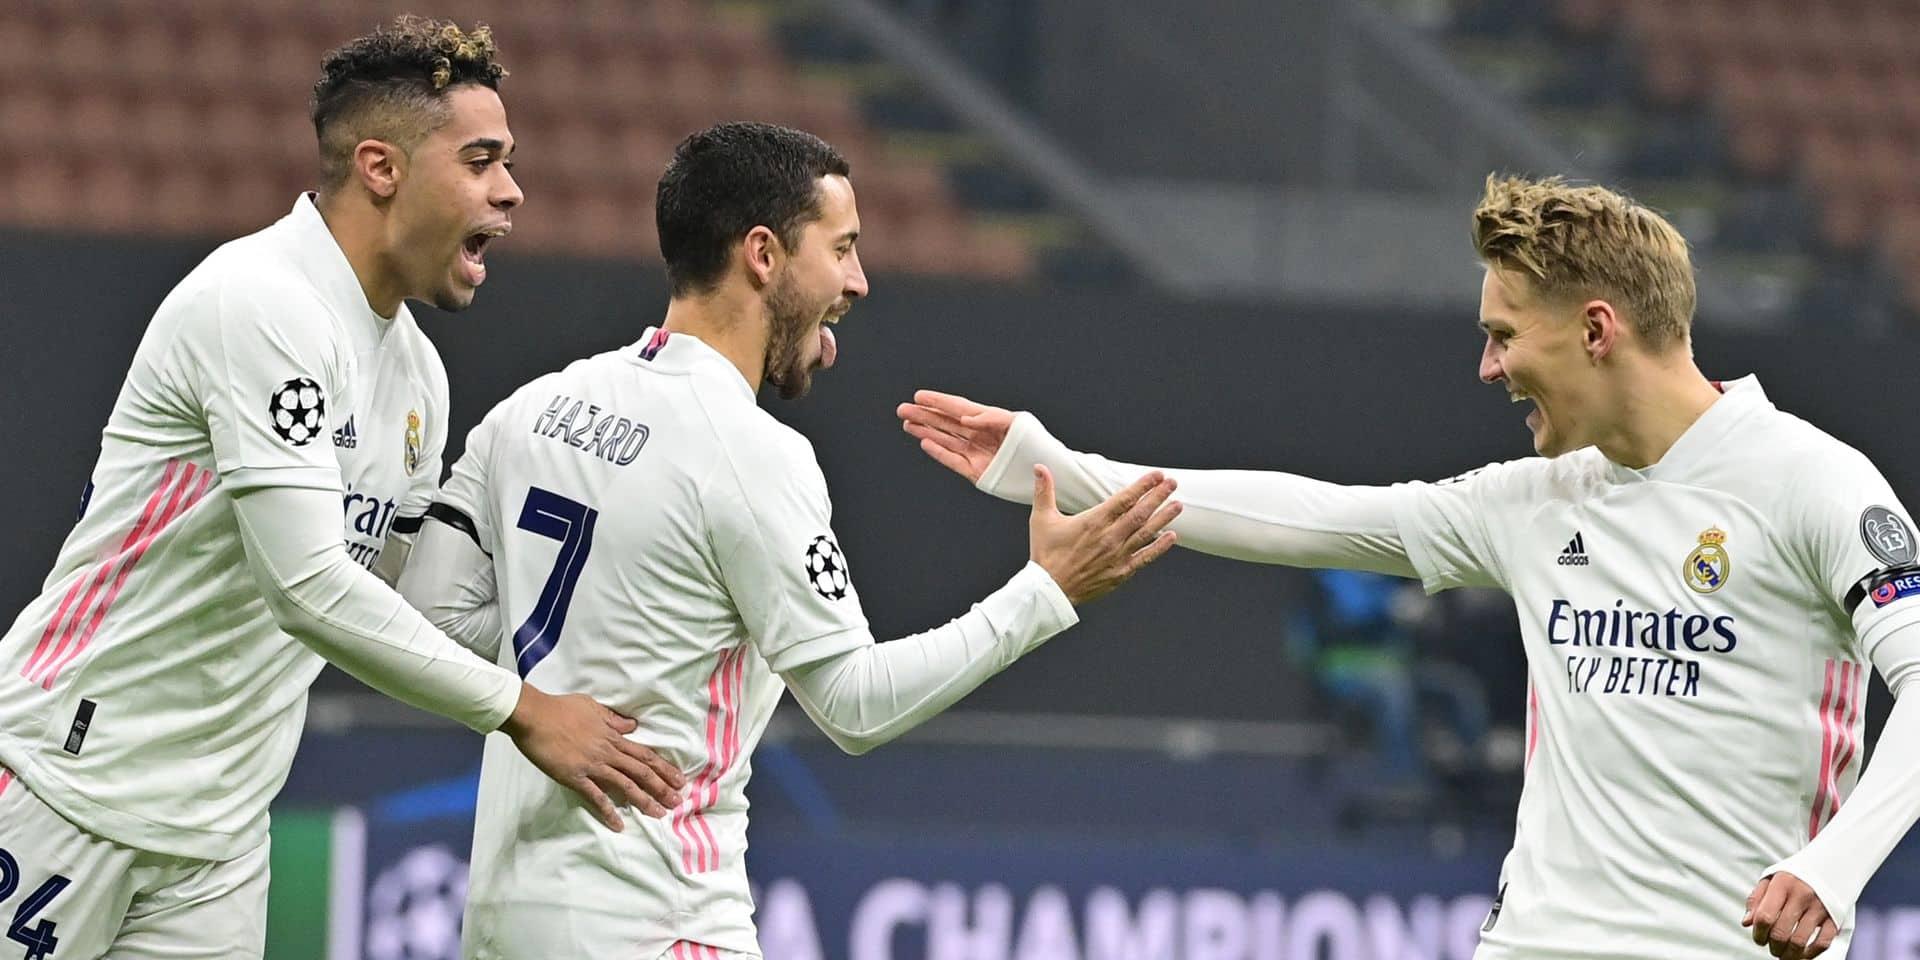 Le Real de Hazard élimine (presque) l'Inter de Lukaku